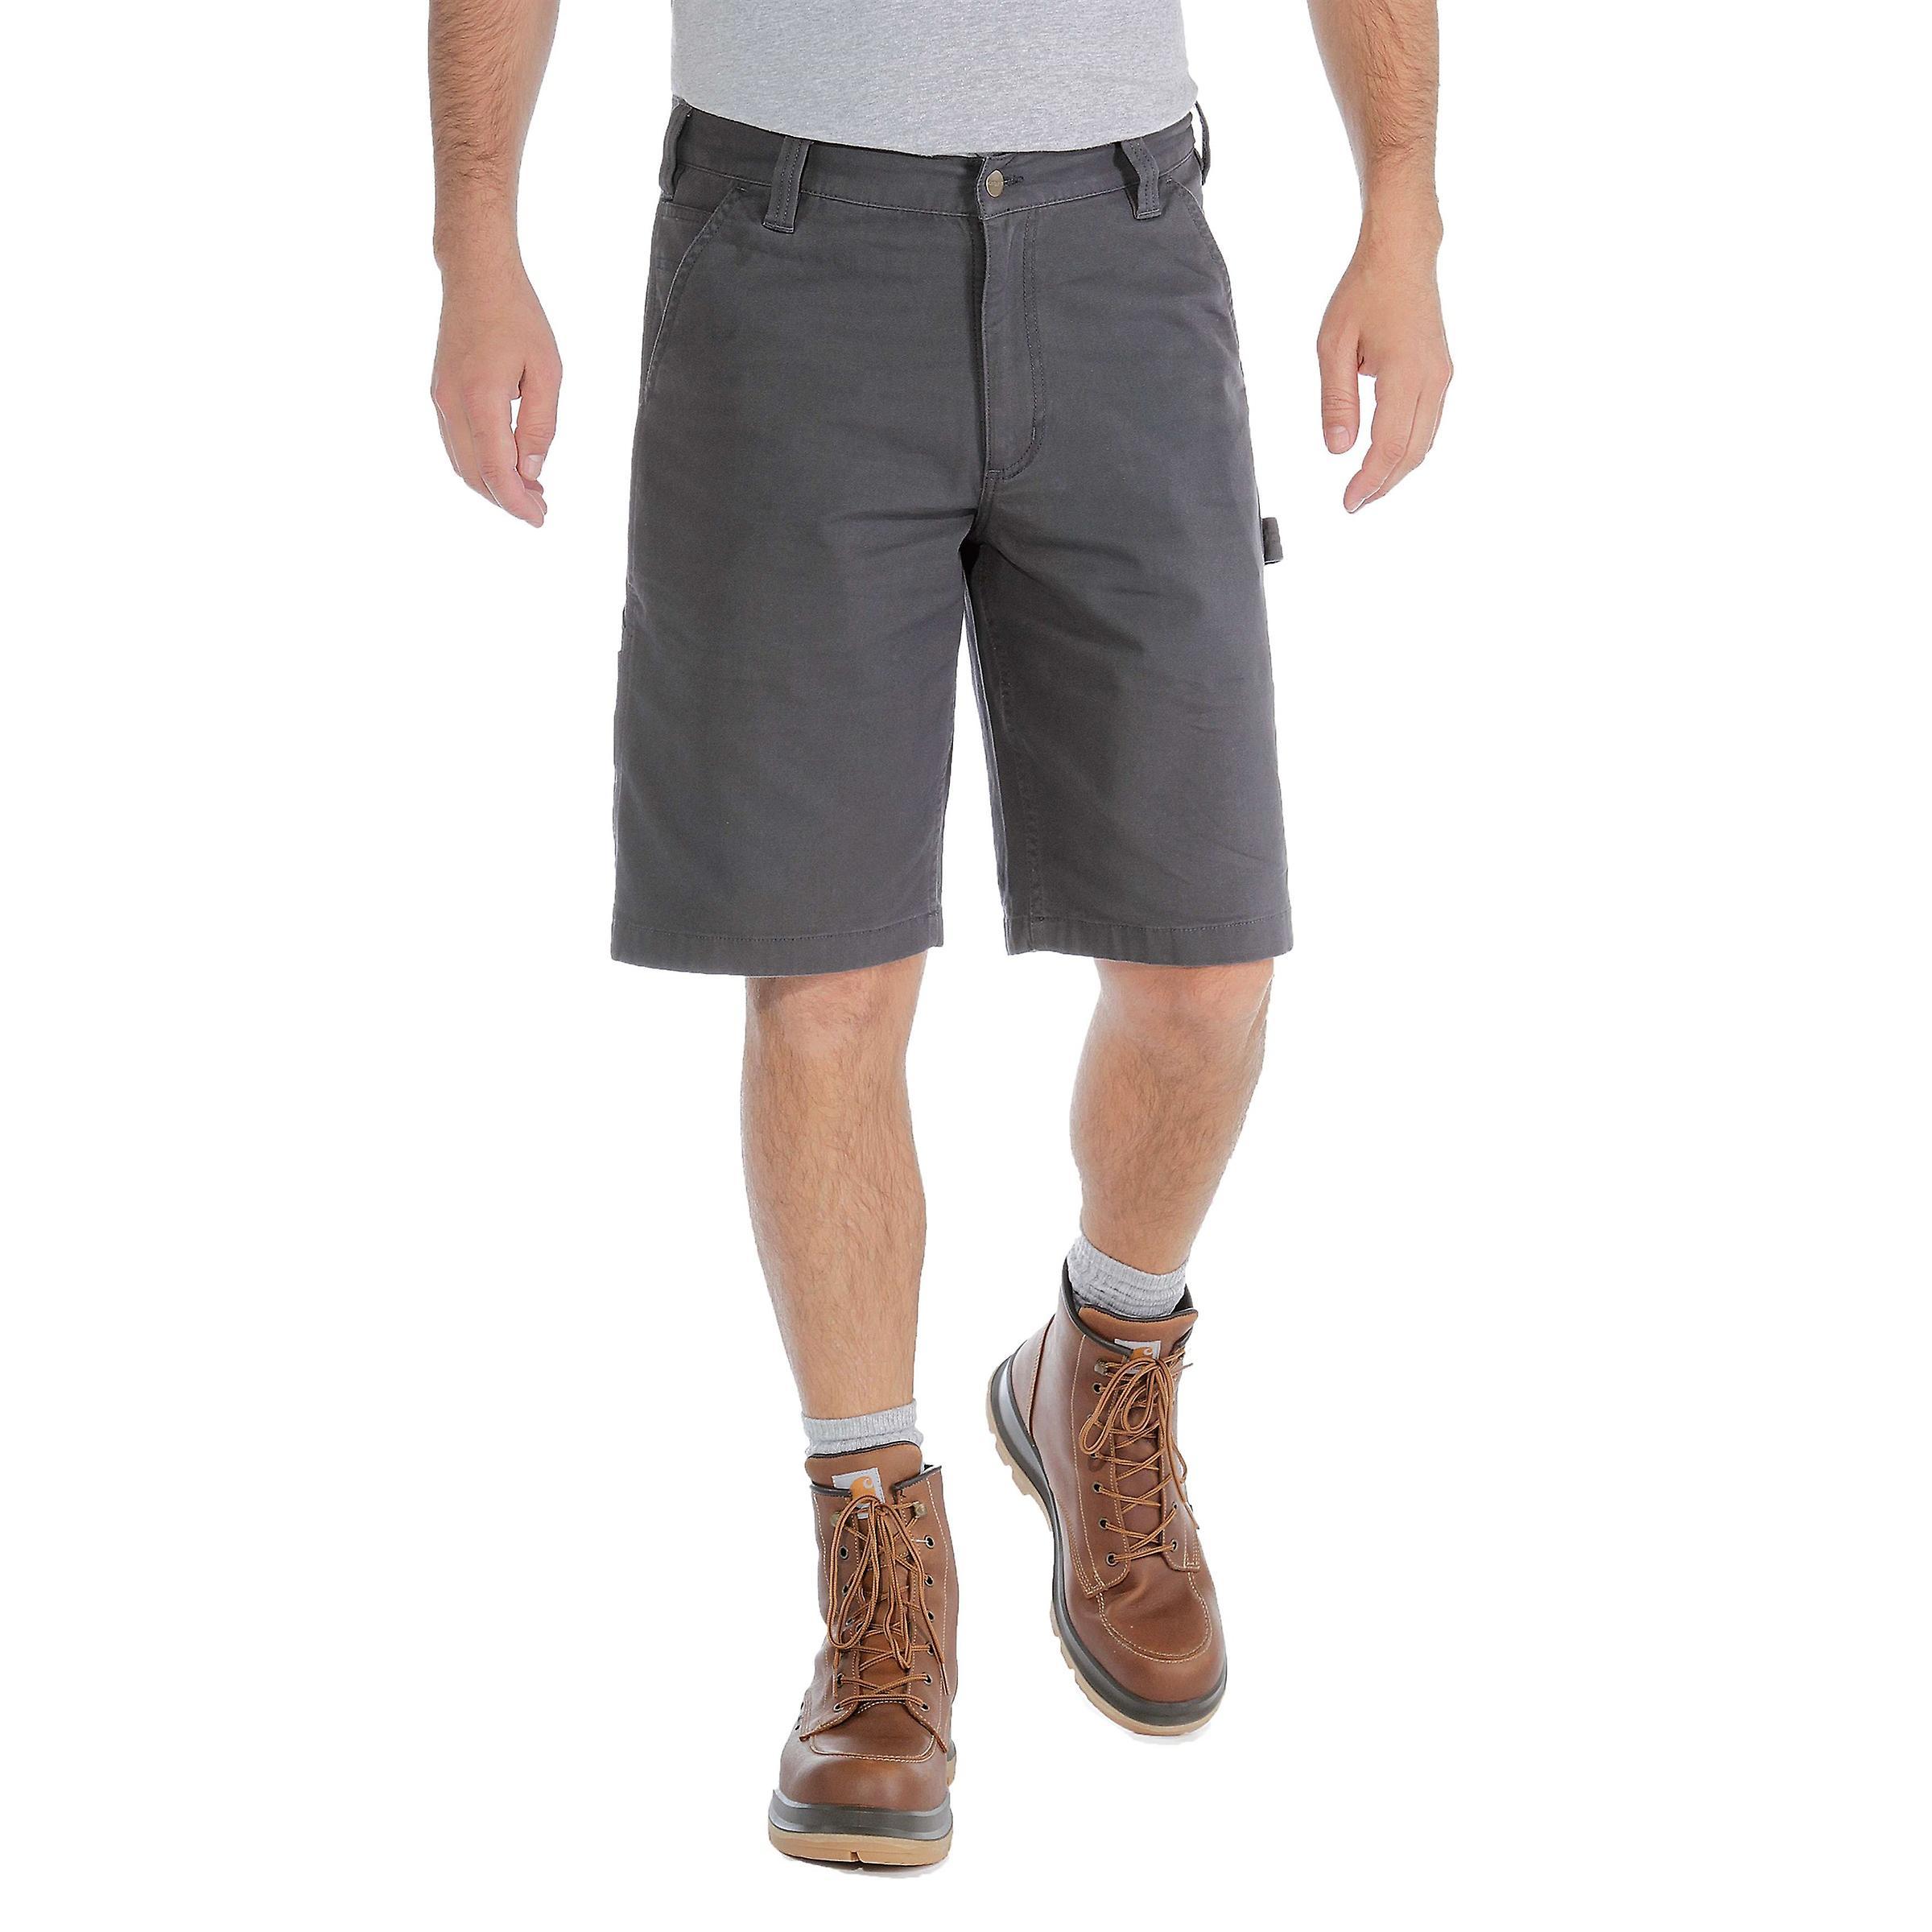 Carhartt homme shorts robuste travail Flex Rigby